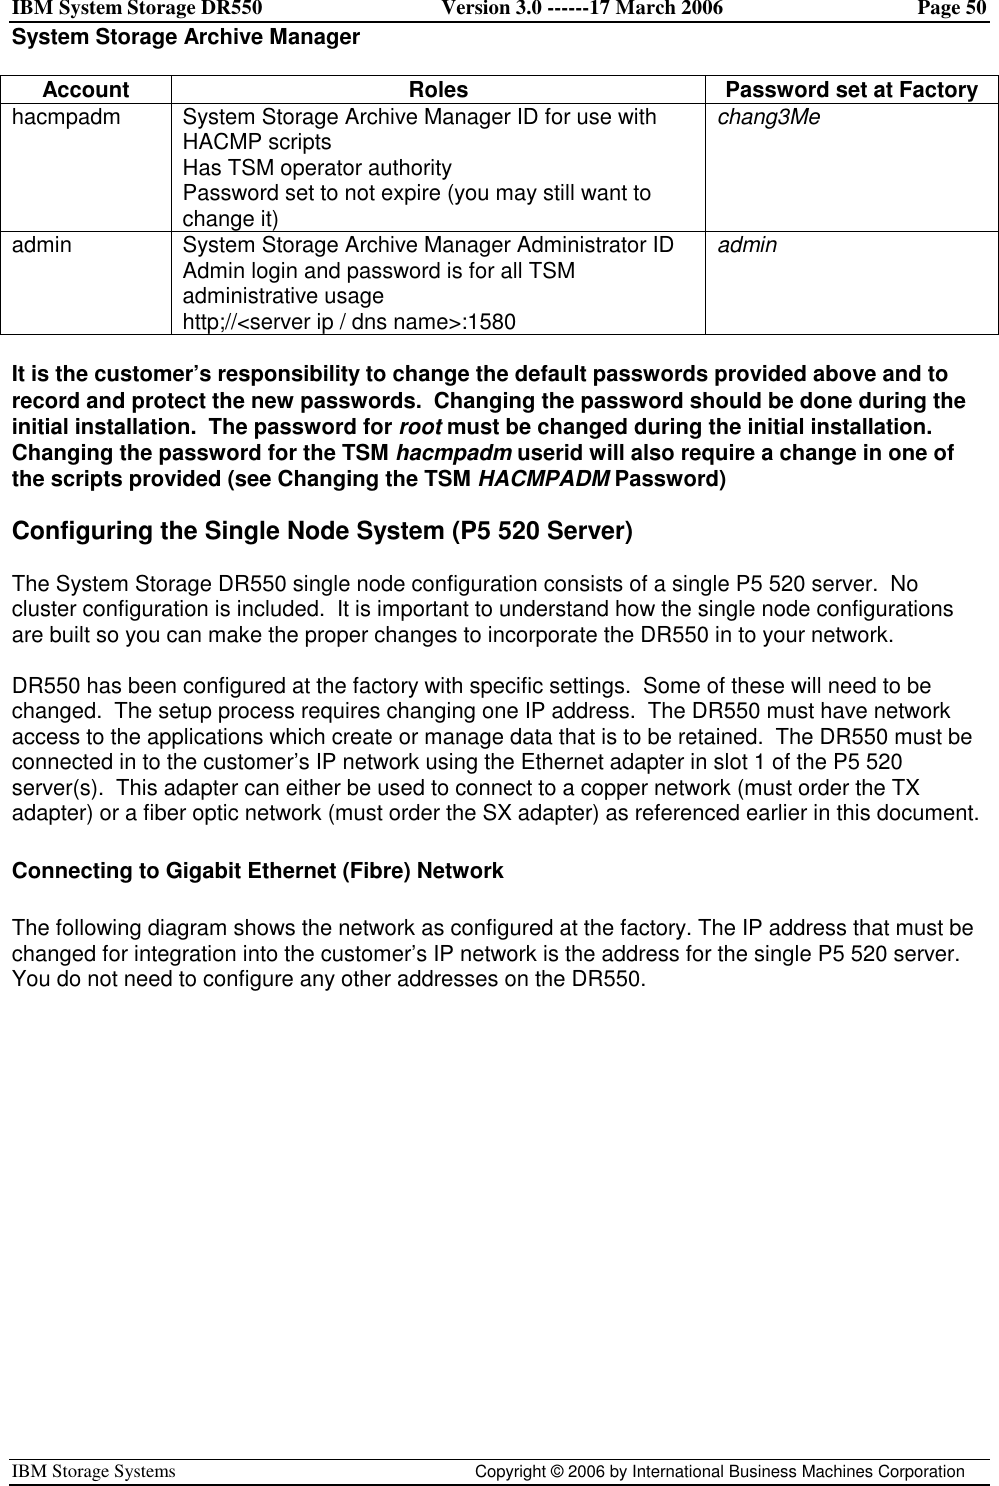 Ibm Dr550 Users Manual User's Guide V3 0